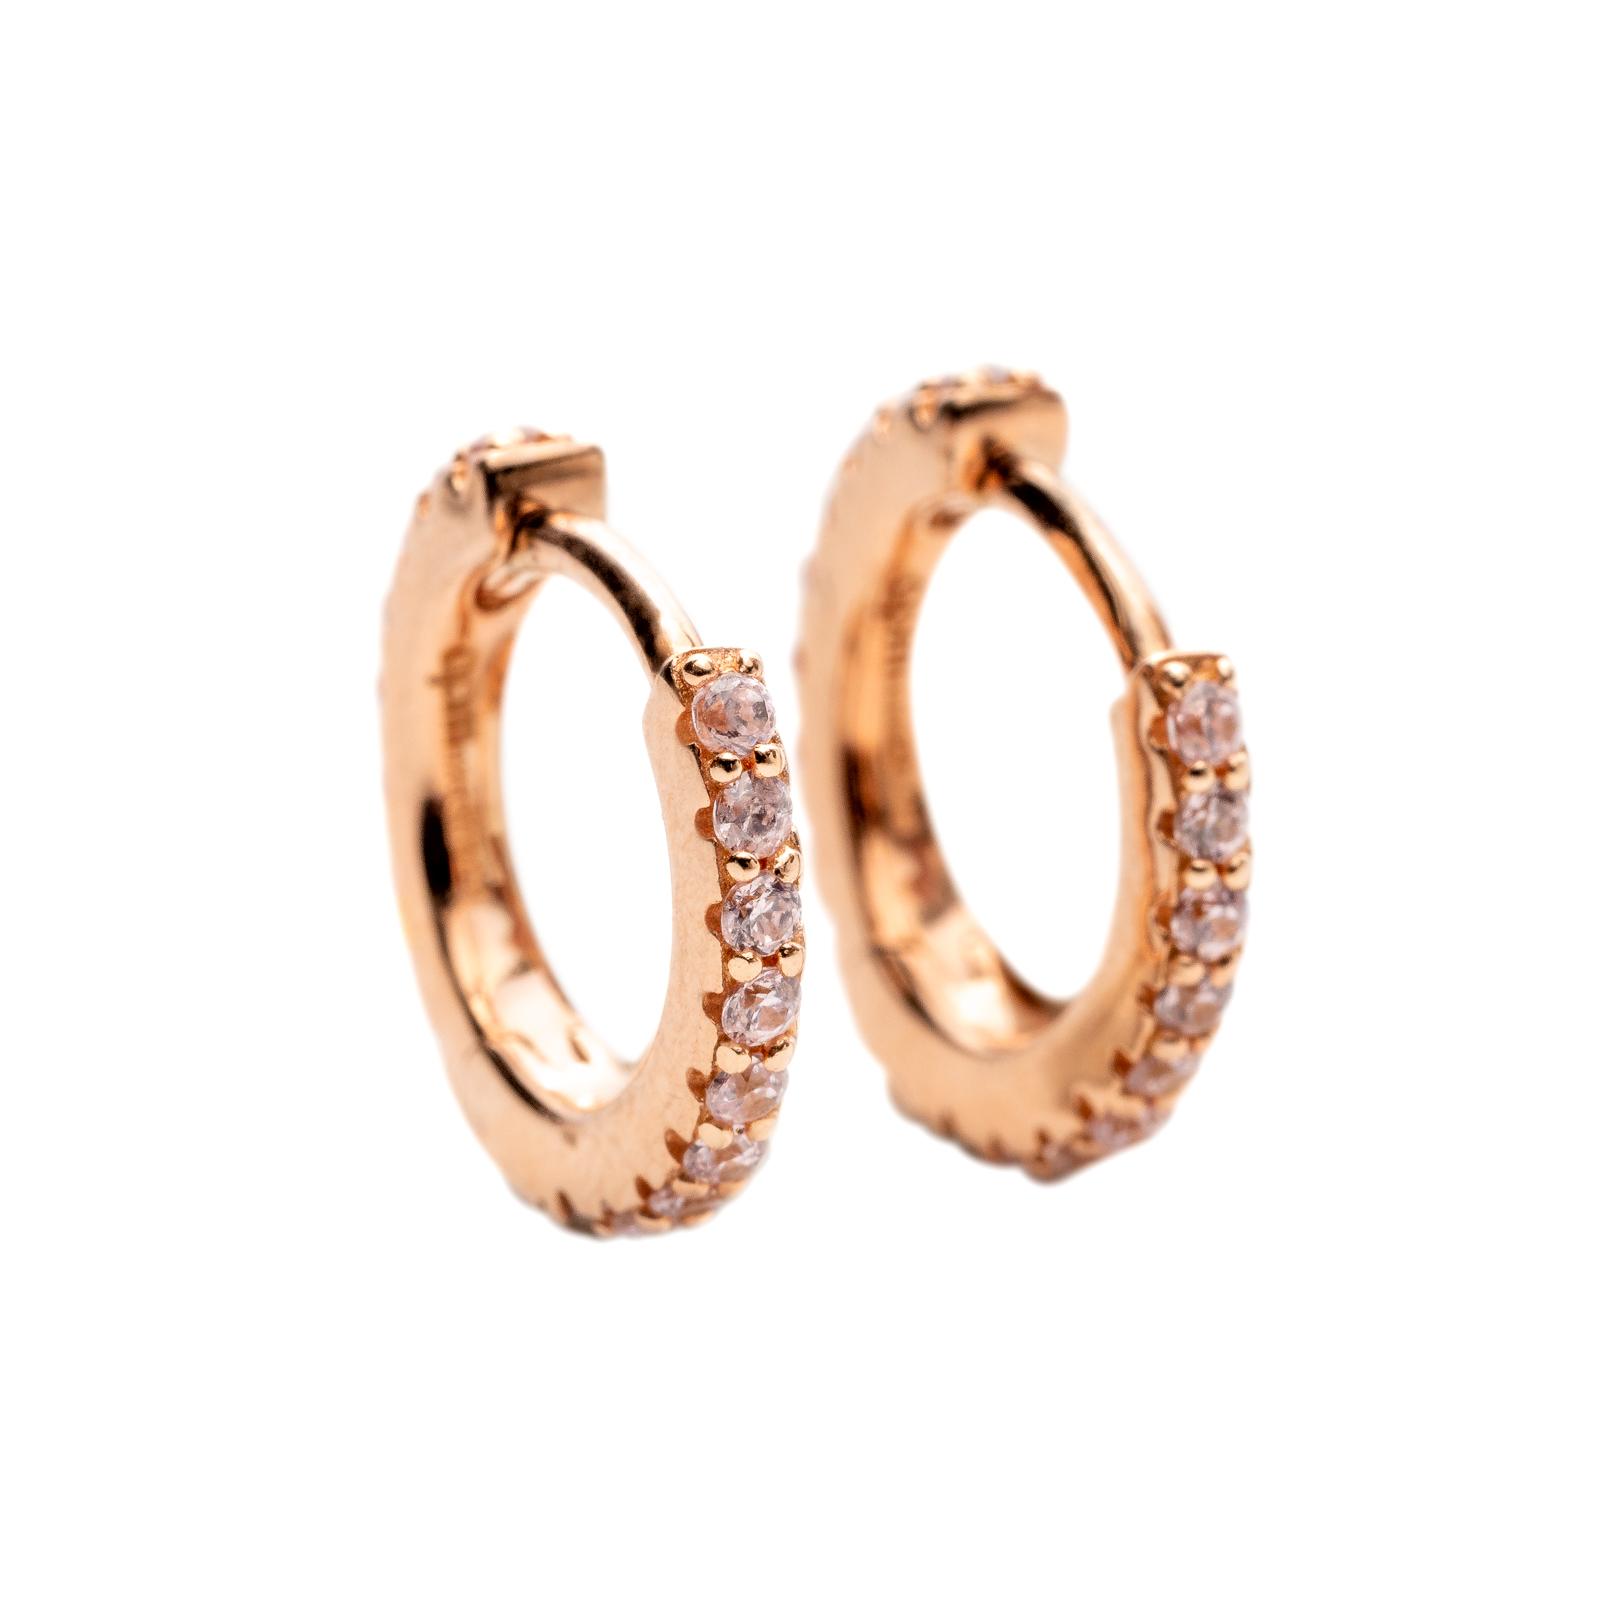 GOLDEN HOOPS WITH PINK MORGANITES 10.000 NOK   18 kt gold and pink morganites